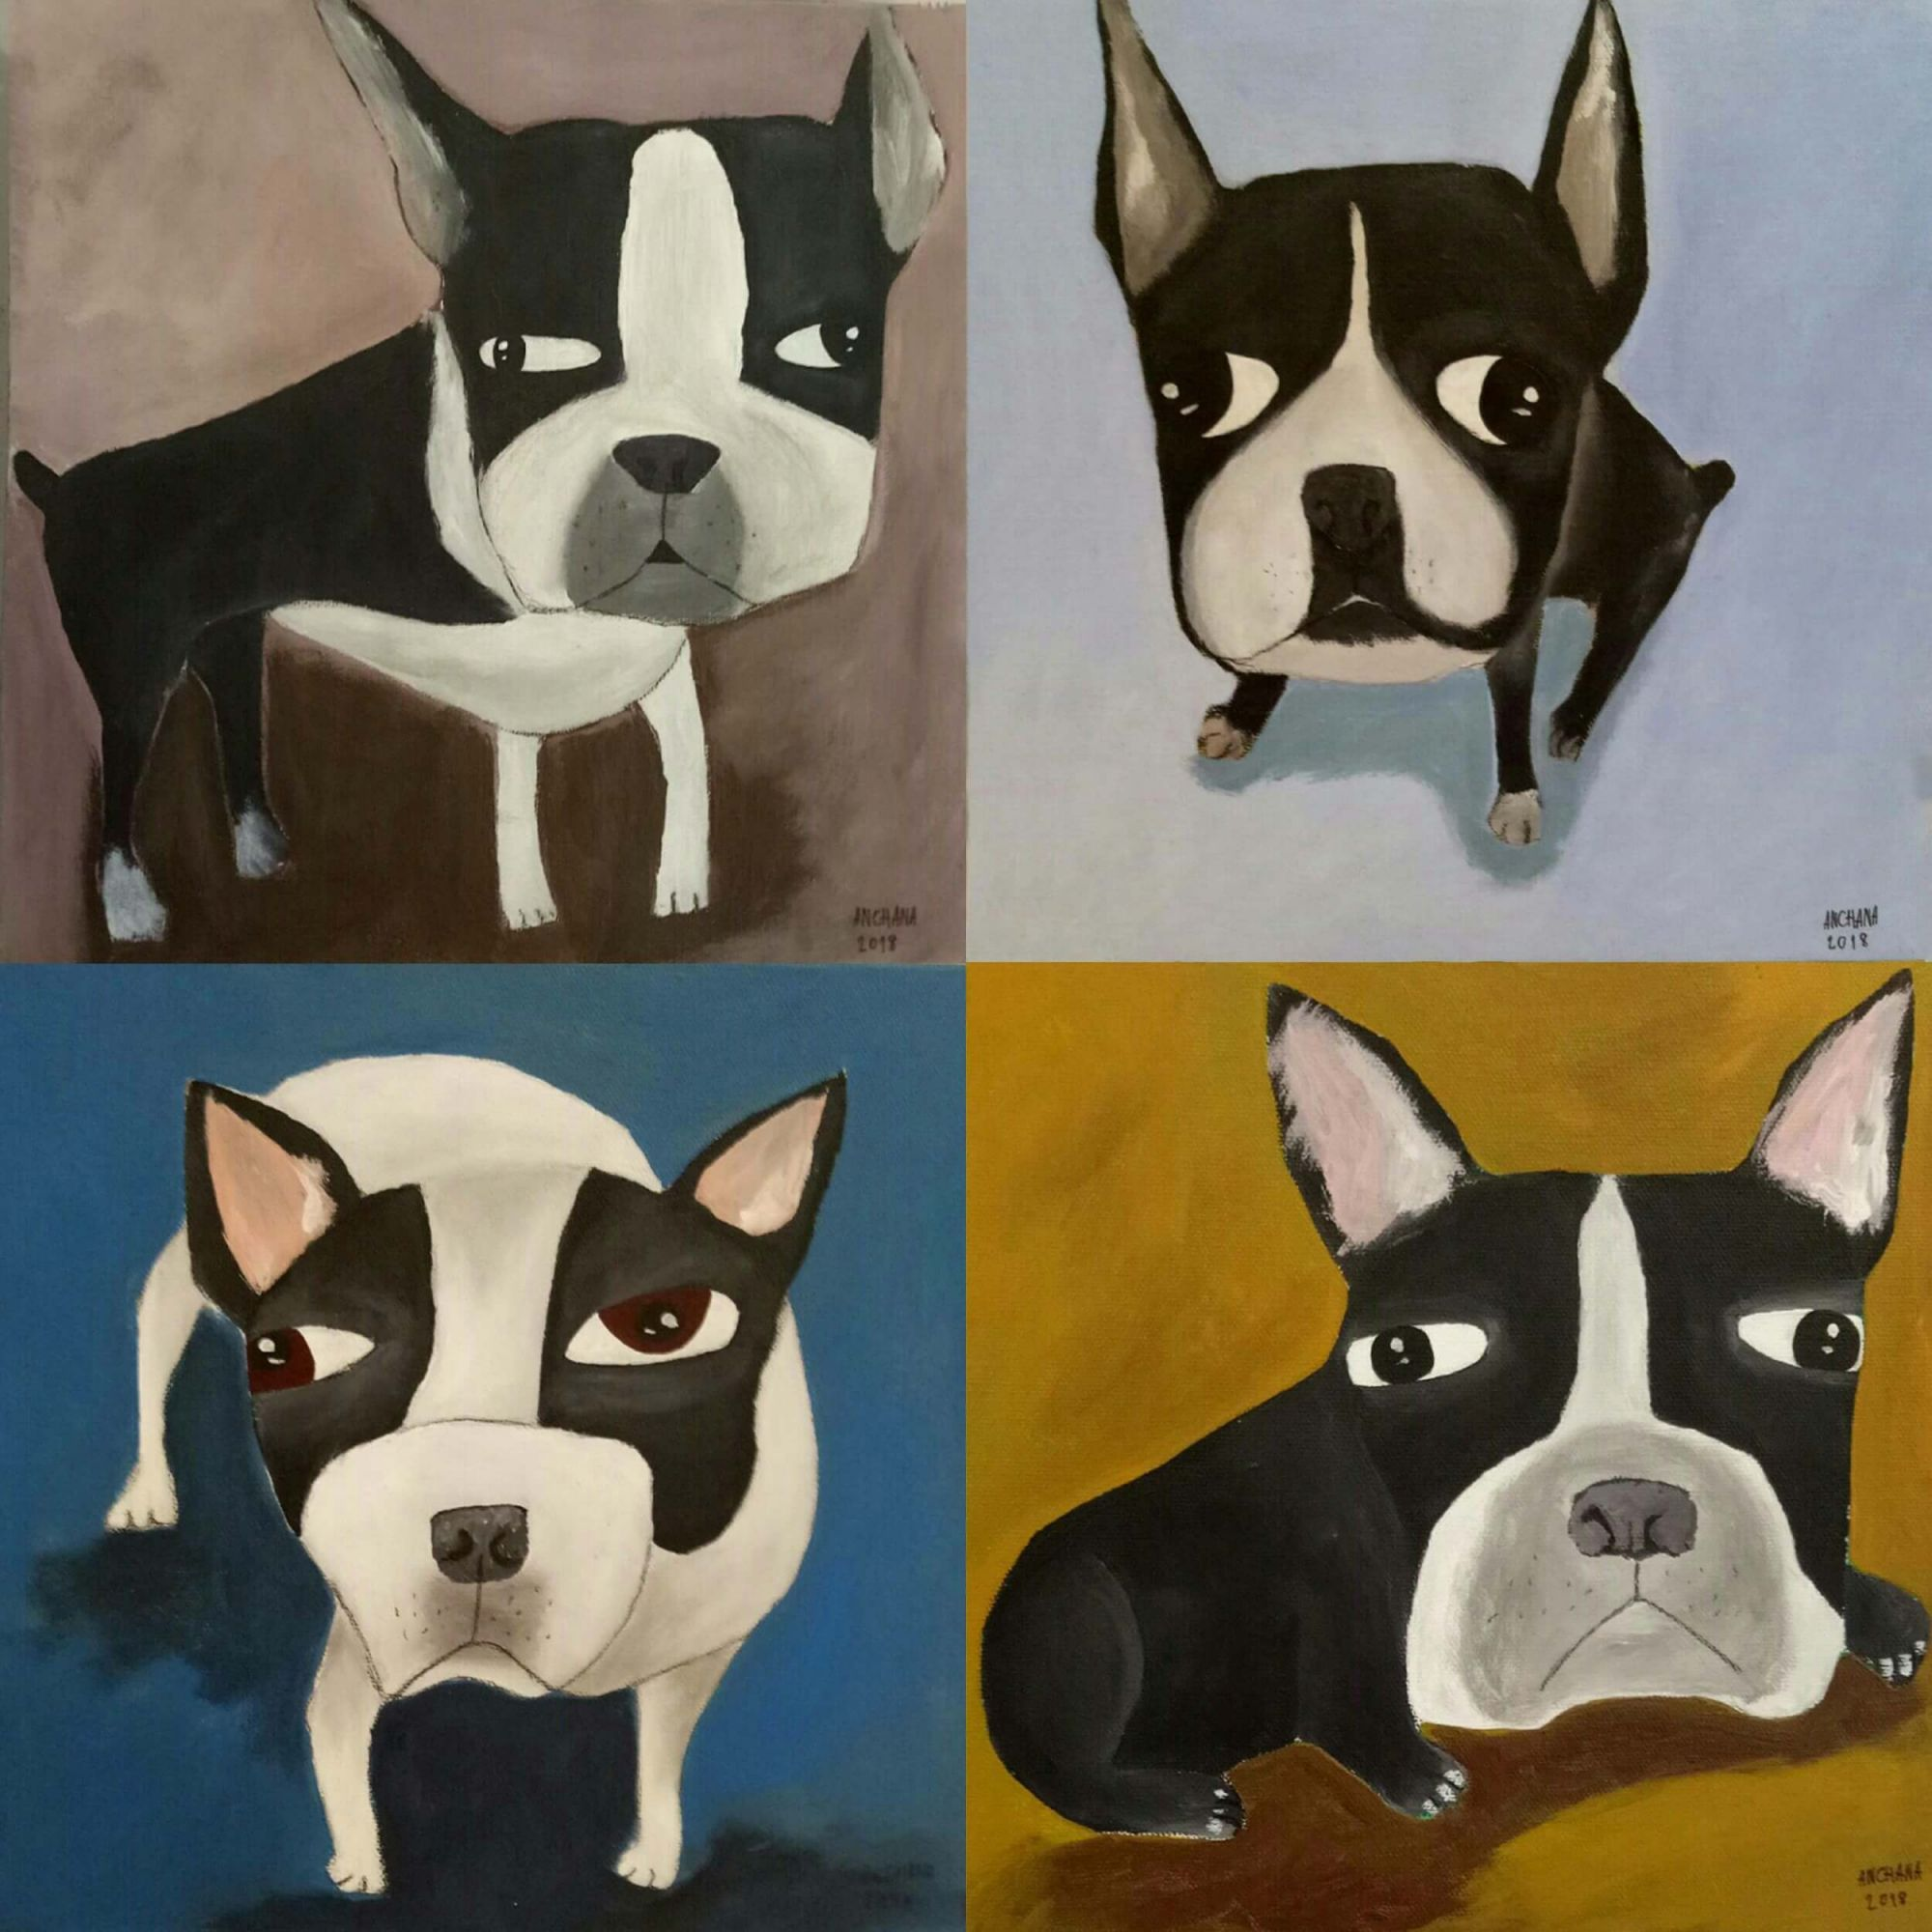 安恰娜‧恰麗亞琵朋的畫作-French Bulldog Series。(圖片由多納藝術提供)